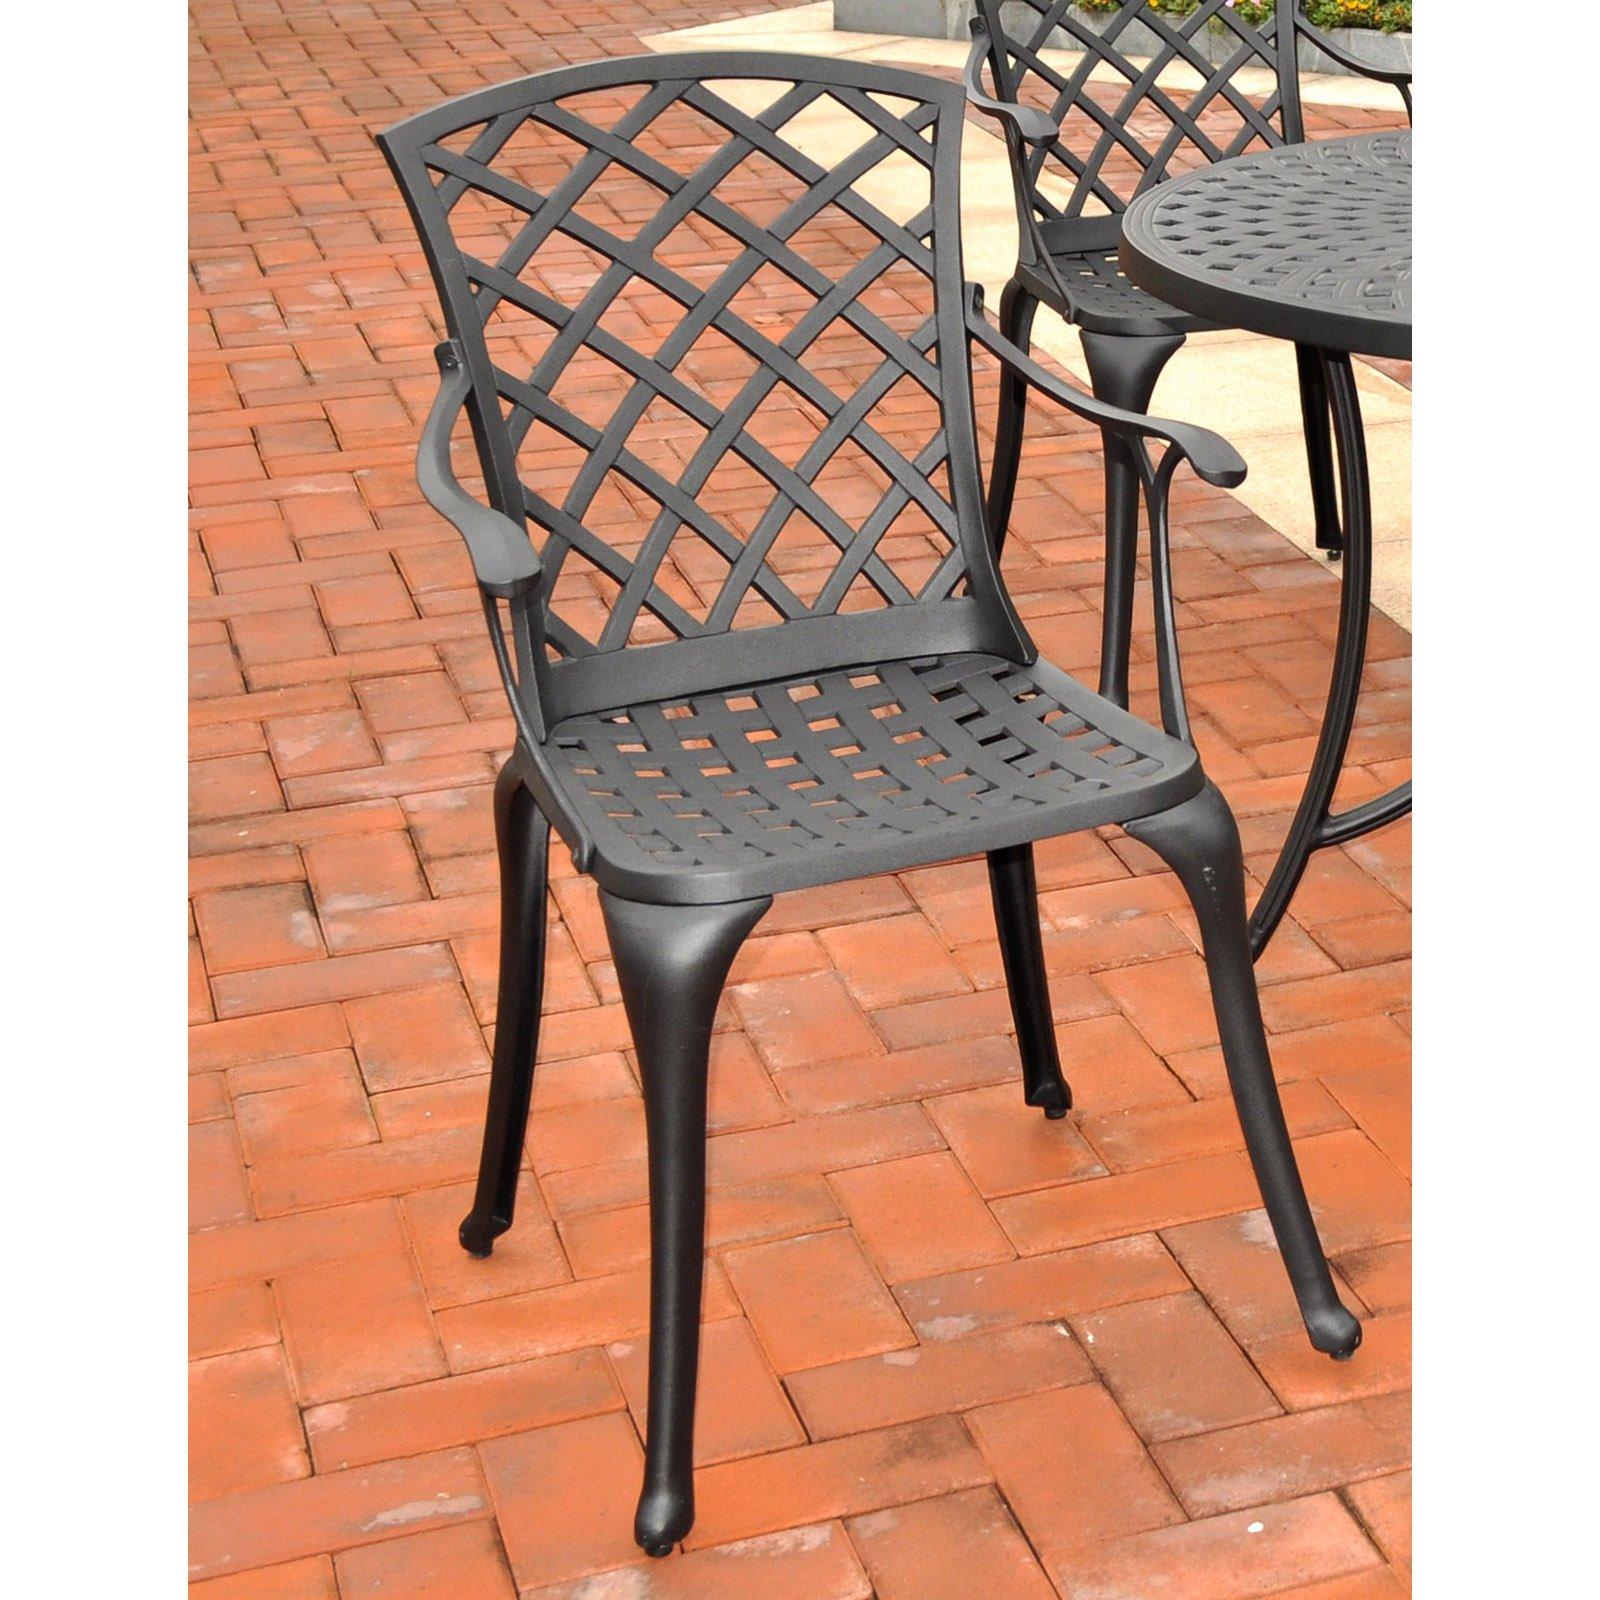 Crosley Furniture Sedona Cast Aluminum High Back Arm Chair in Charcoal Black Finish, 2pk